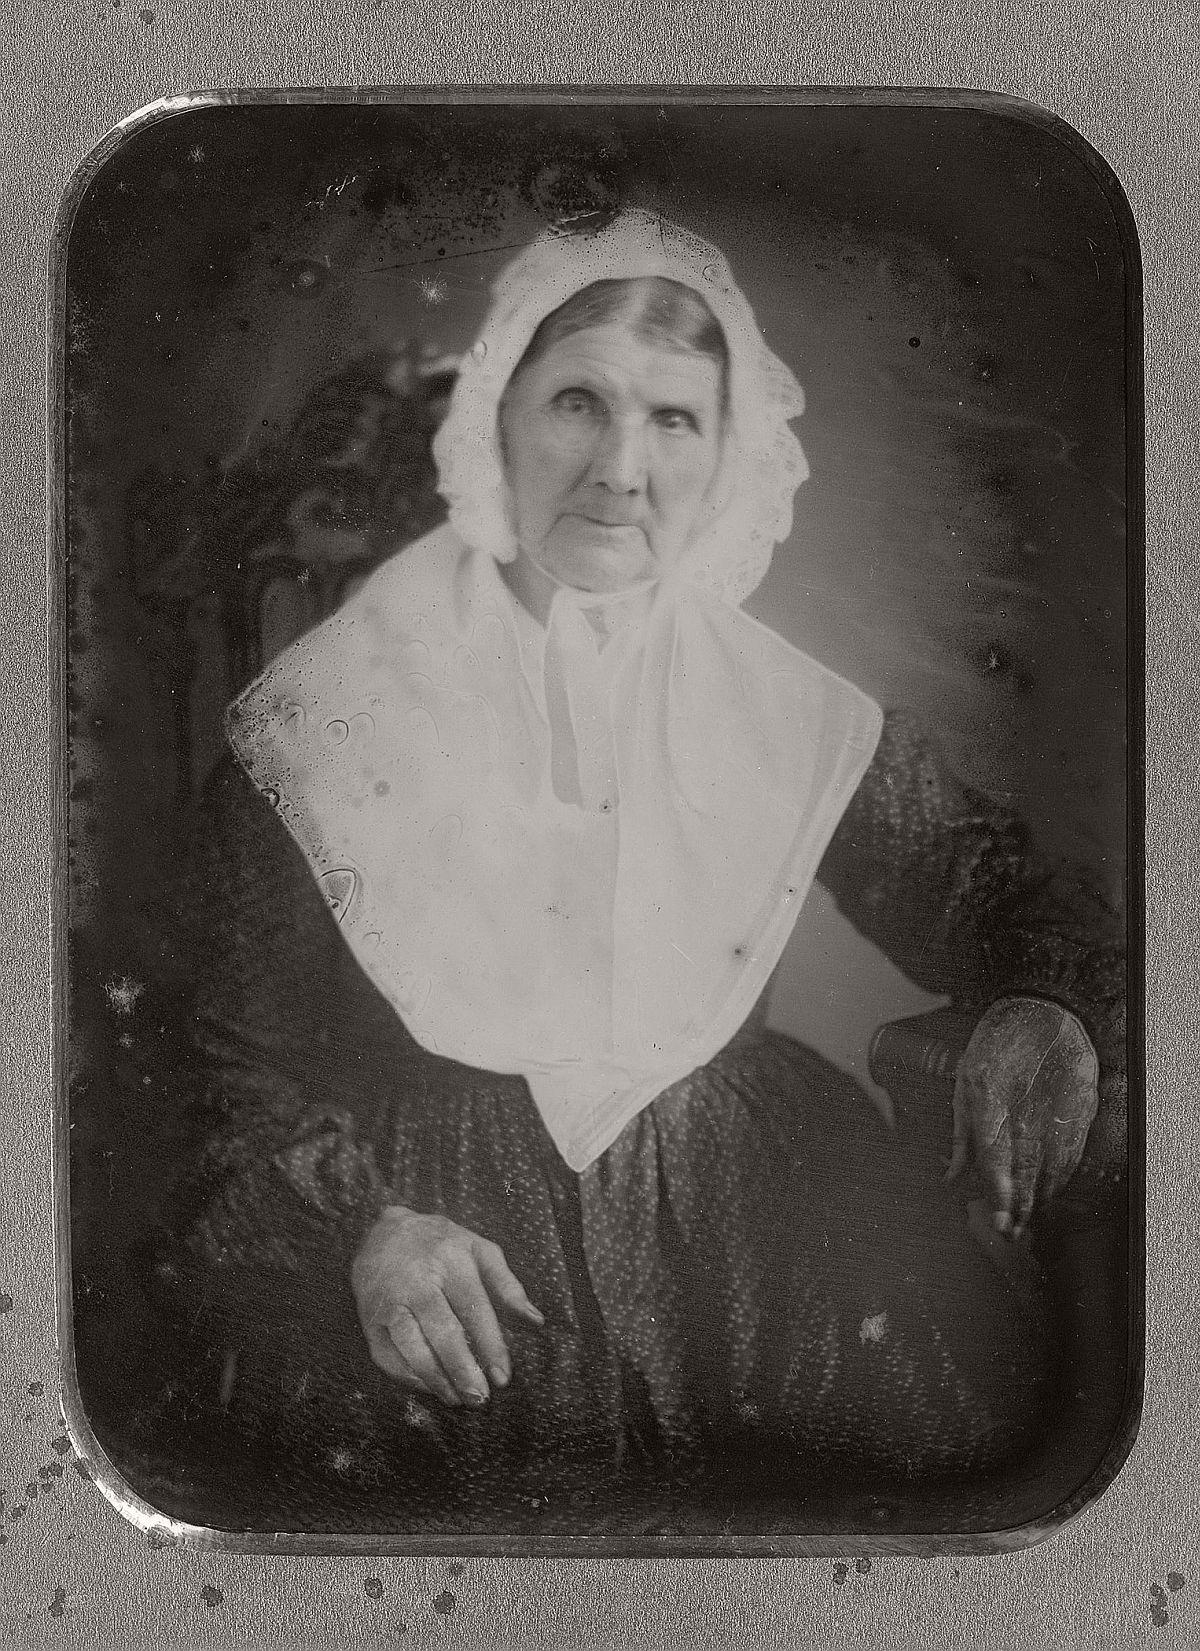 daguerreotype-portrait-ladies-born-in-the-late-18th-century-1700s-vintage-20